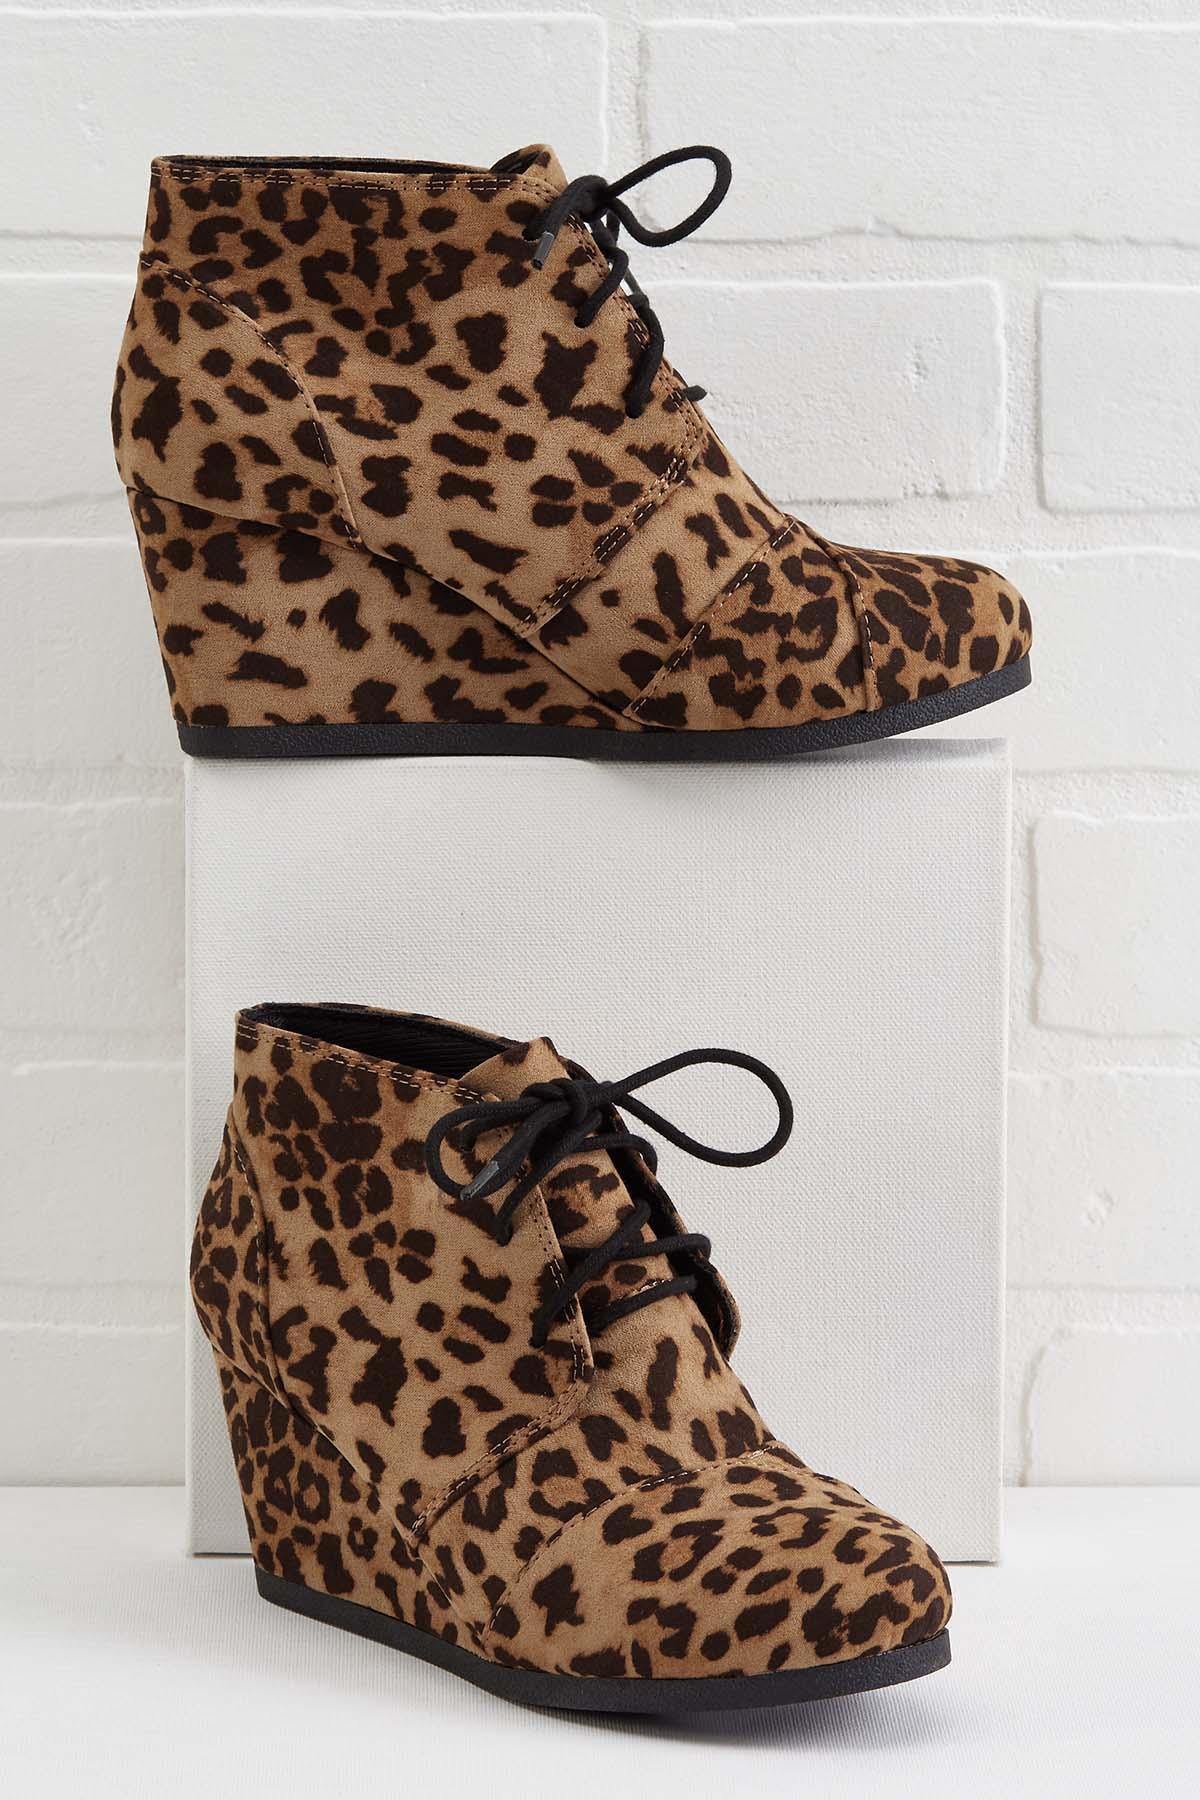 Leopard Lace Up Wedges